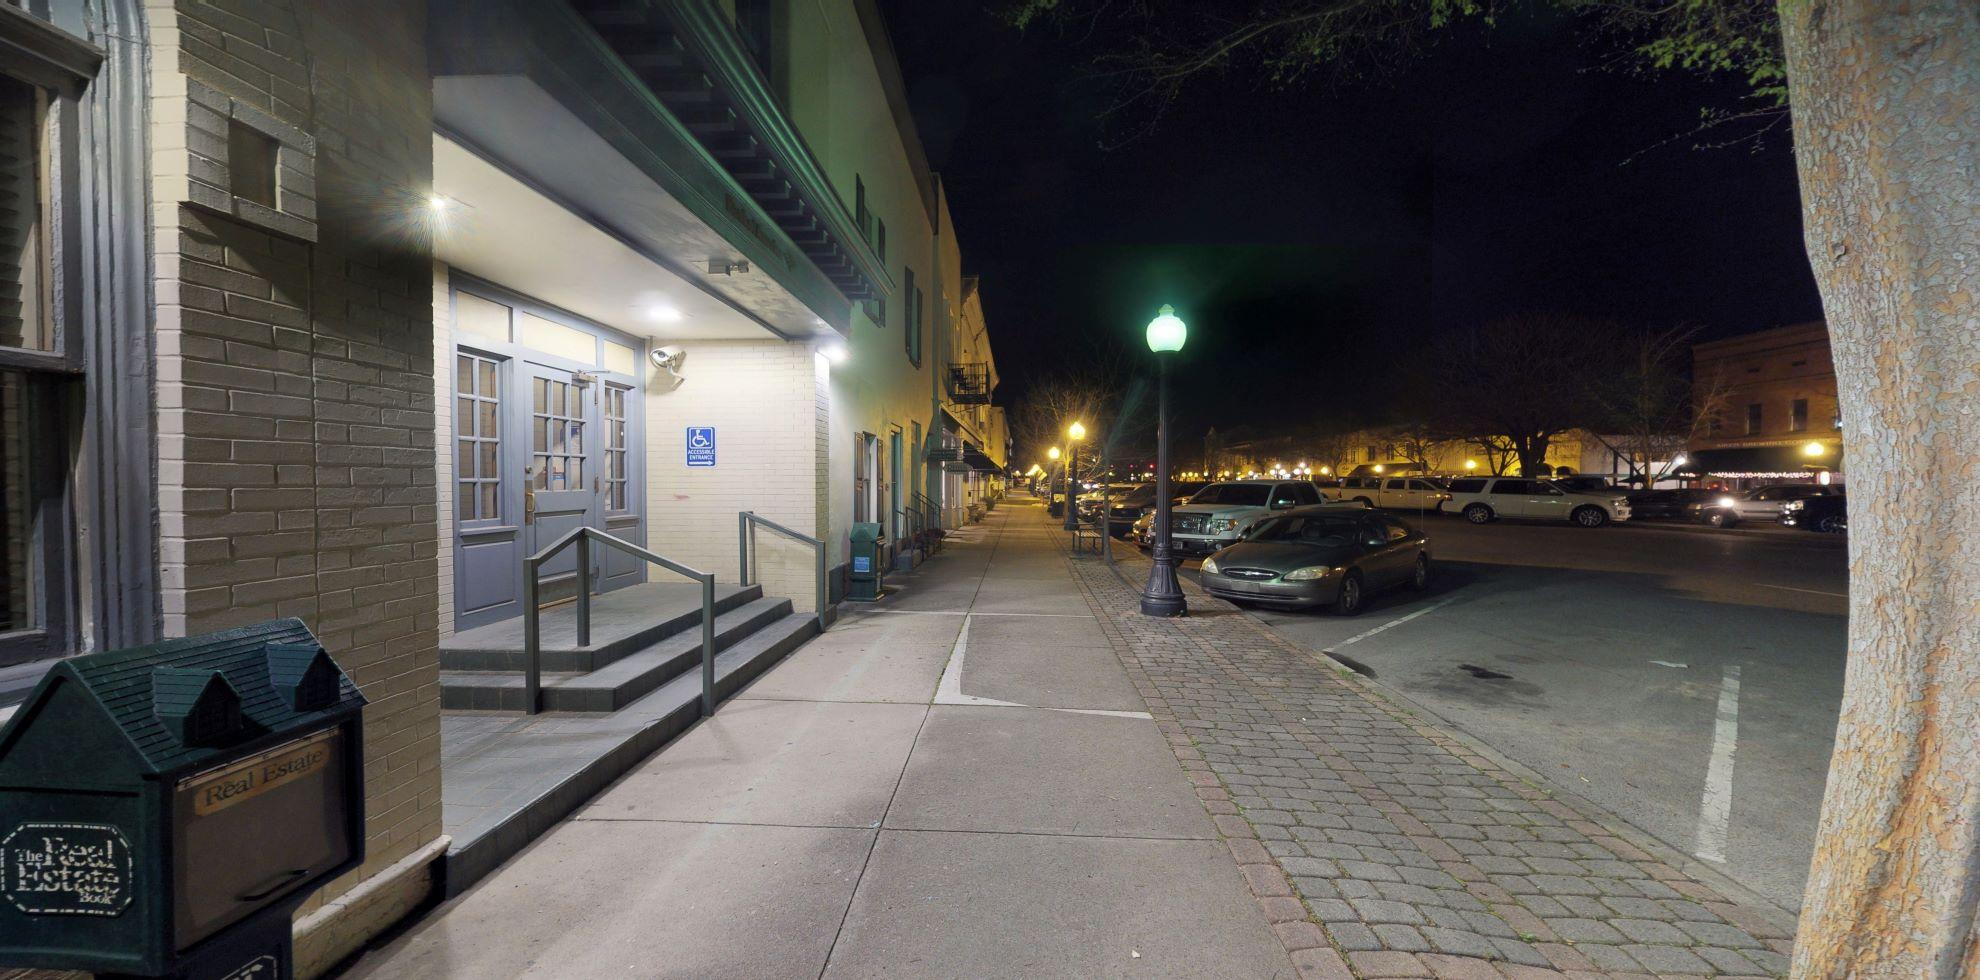 Bank of America financial center with drive-thru ATM | 167 Laurens St SW, Aiken, SC 29801